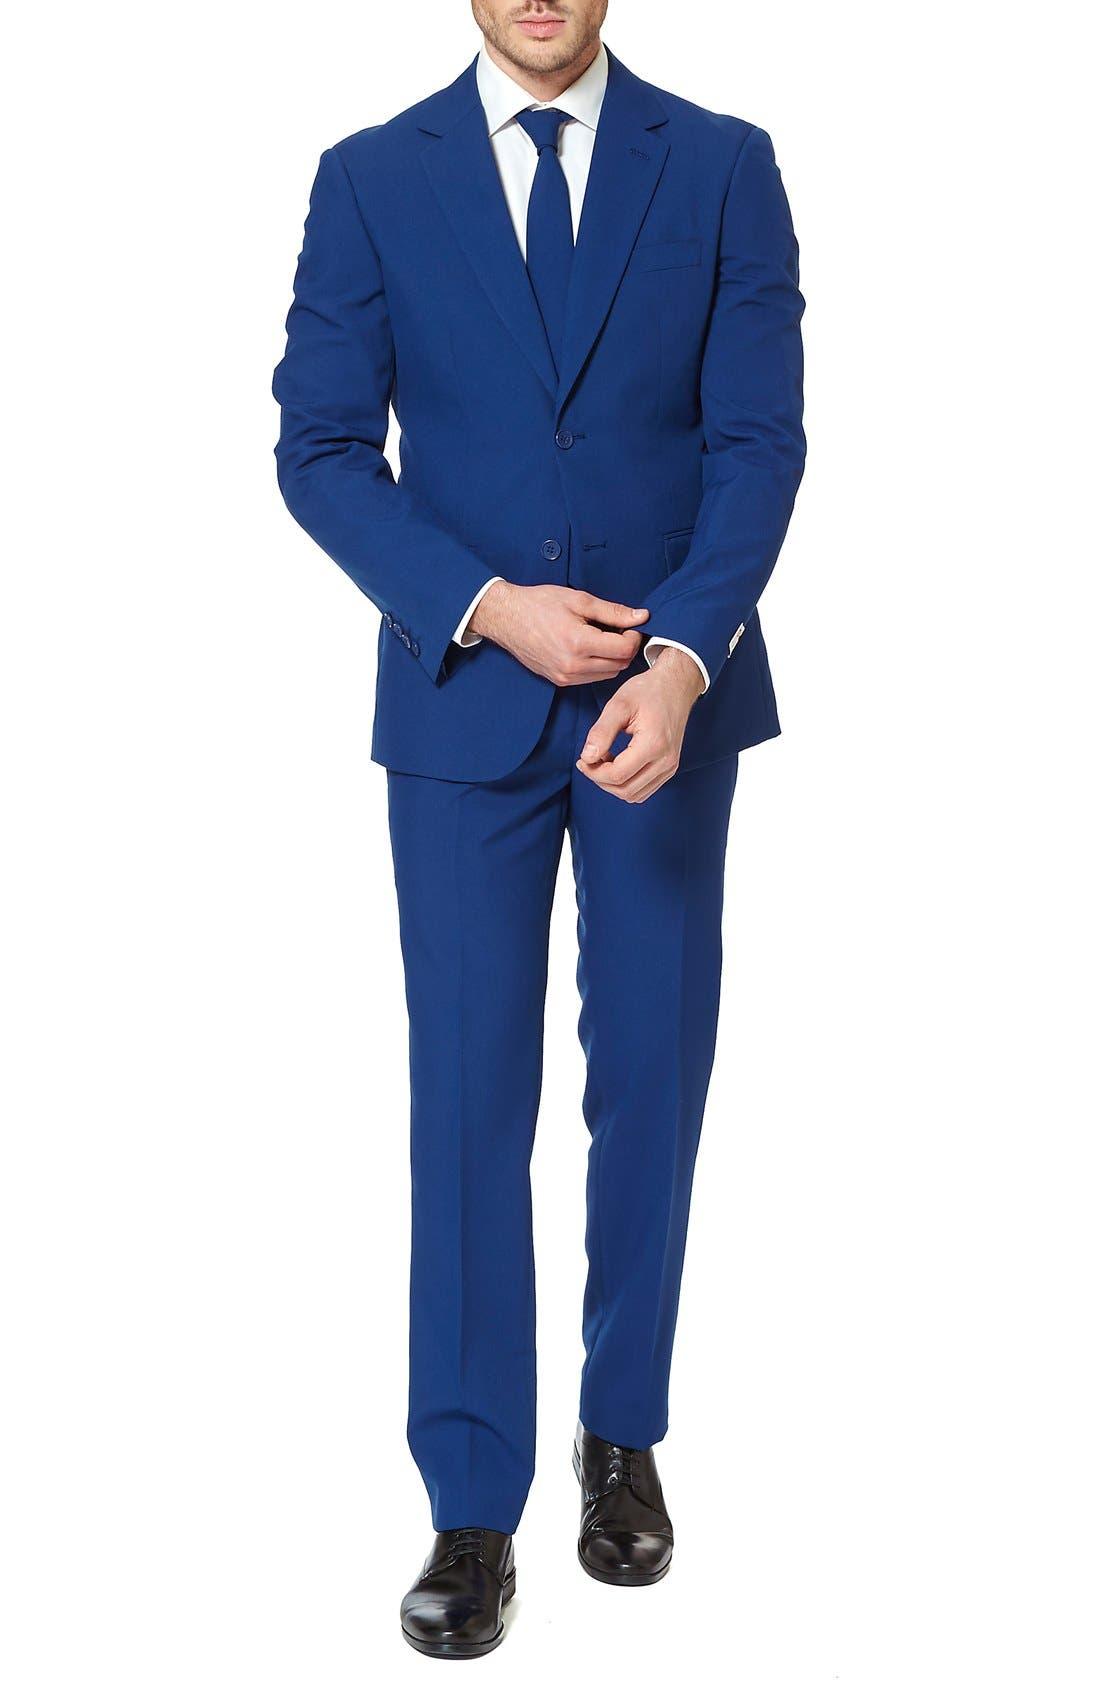 'Navy Royale' Trim Fit Two-Piece Suit with Tie,                             Alternate thumbnail 2, color,                             410